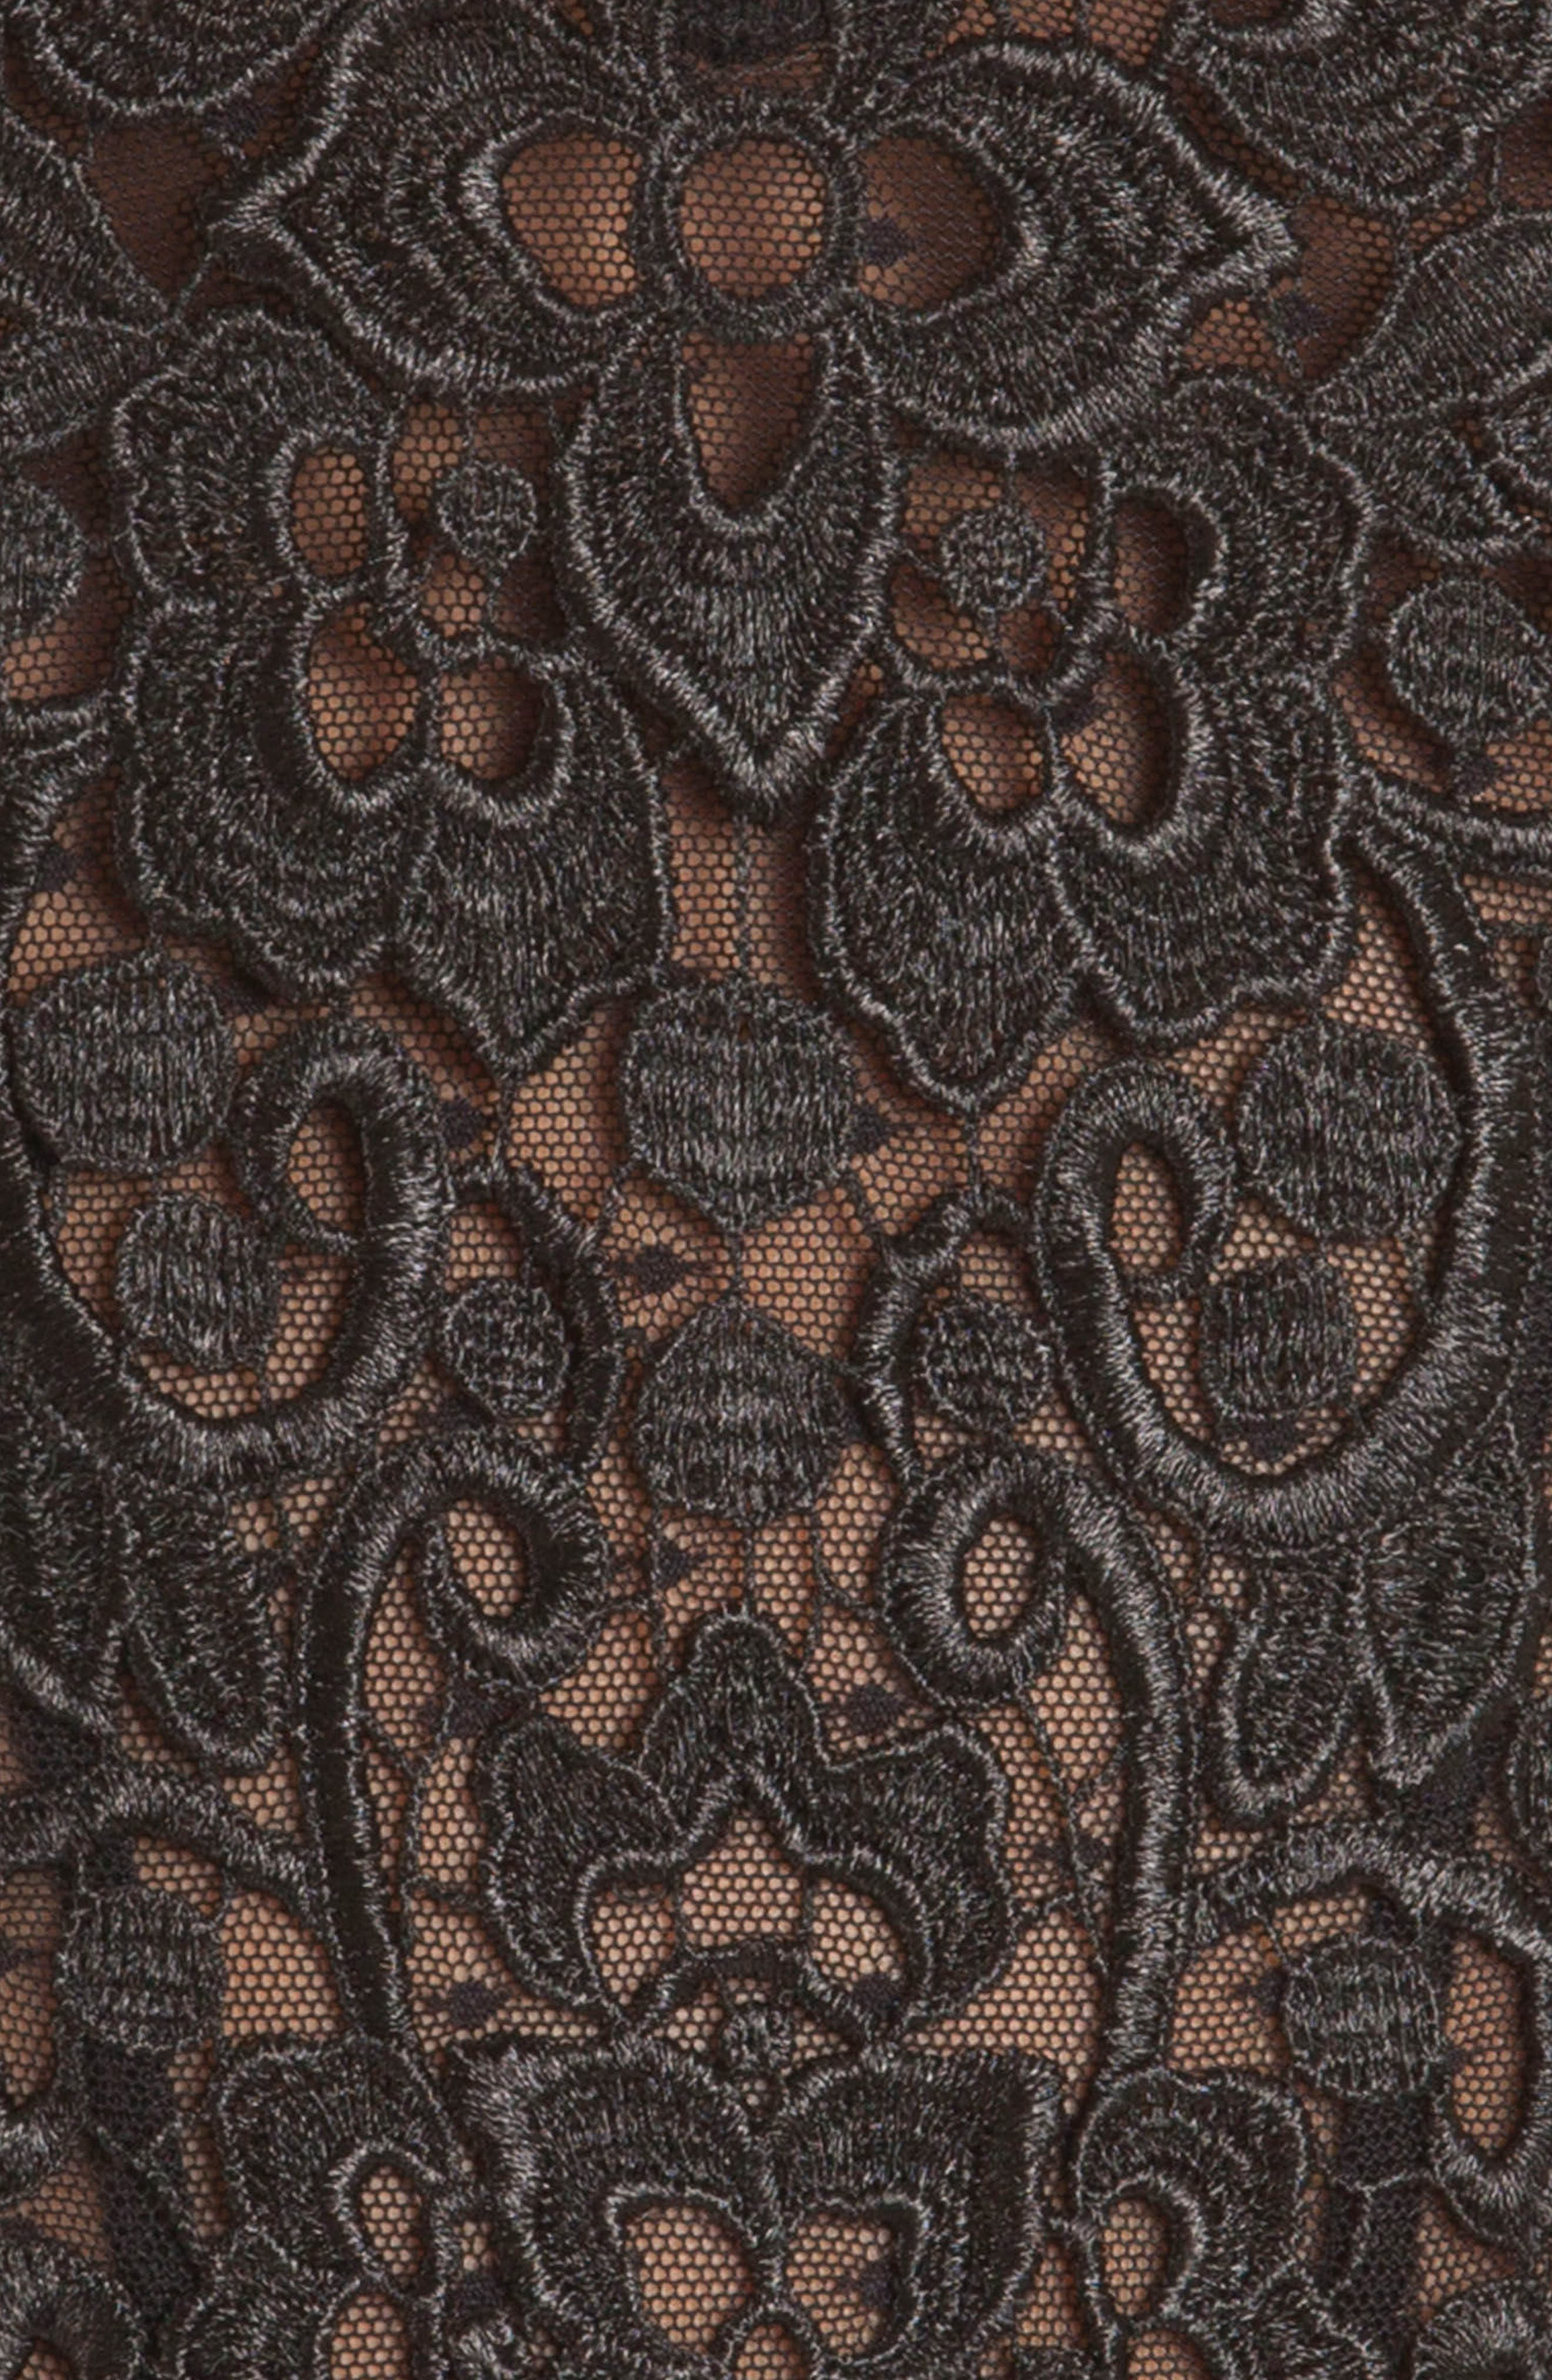 Byzantine Lace & Mesh Teddy,                             Alternate thumbnail 4, color,                             001